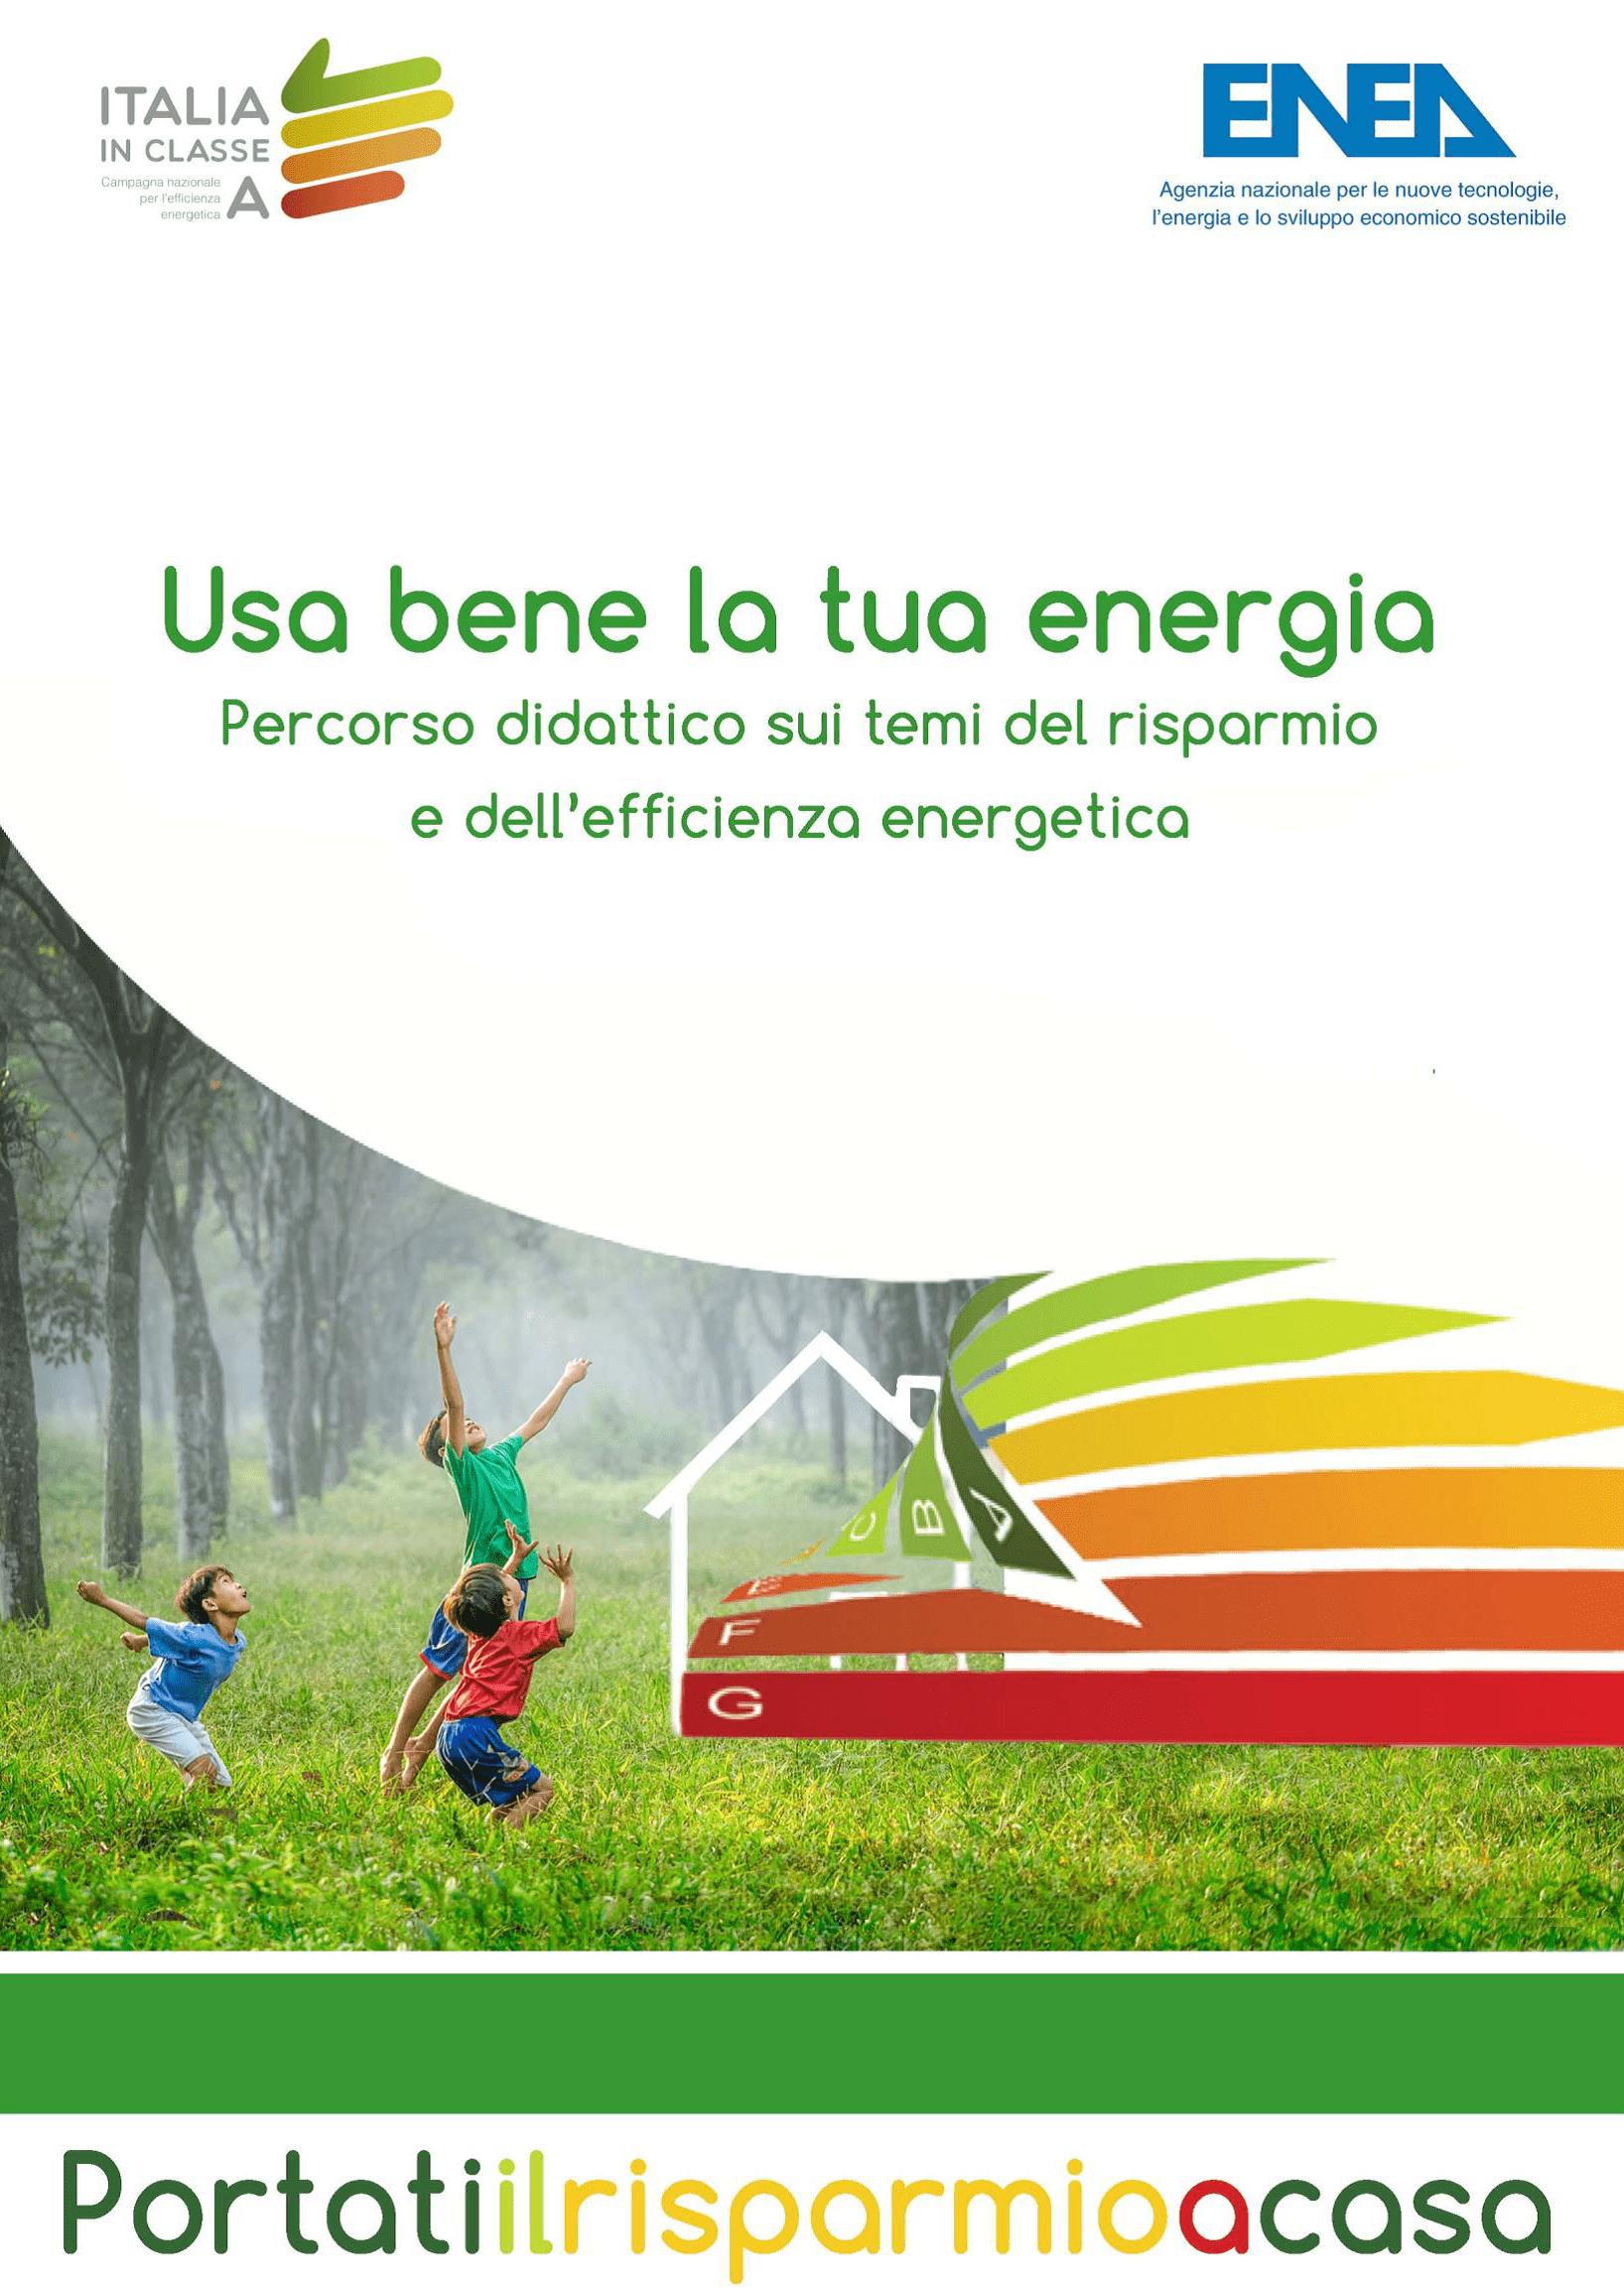 Usa bene la tua energia